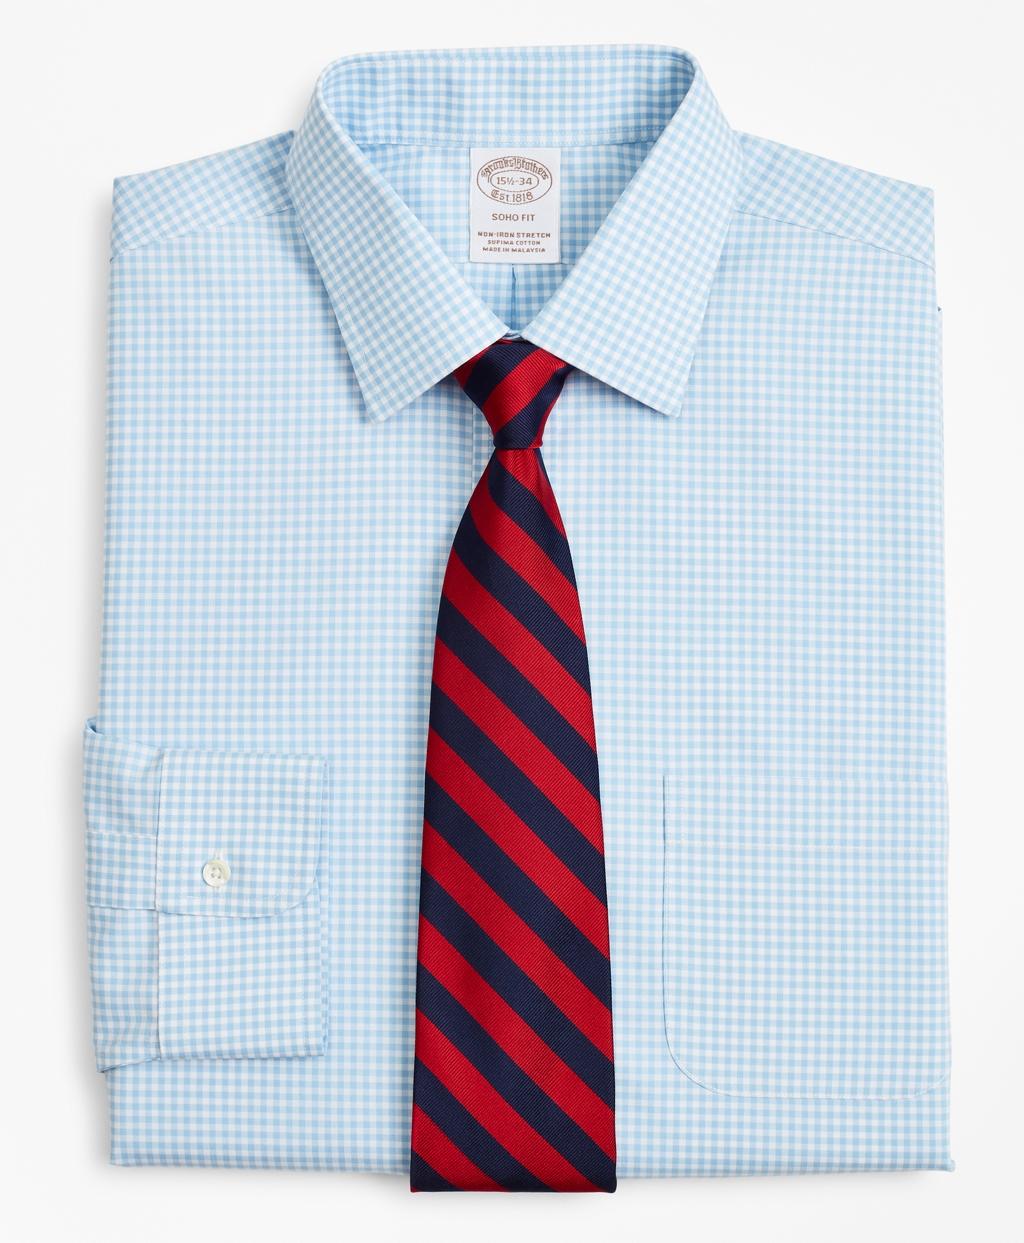 Brooksbrothers Stretch Soho Extra-Slim-Fit Dress Shirt, Non-Iron Poplin Ainsley Collar Gingham